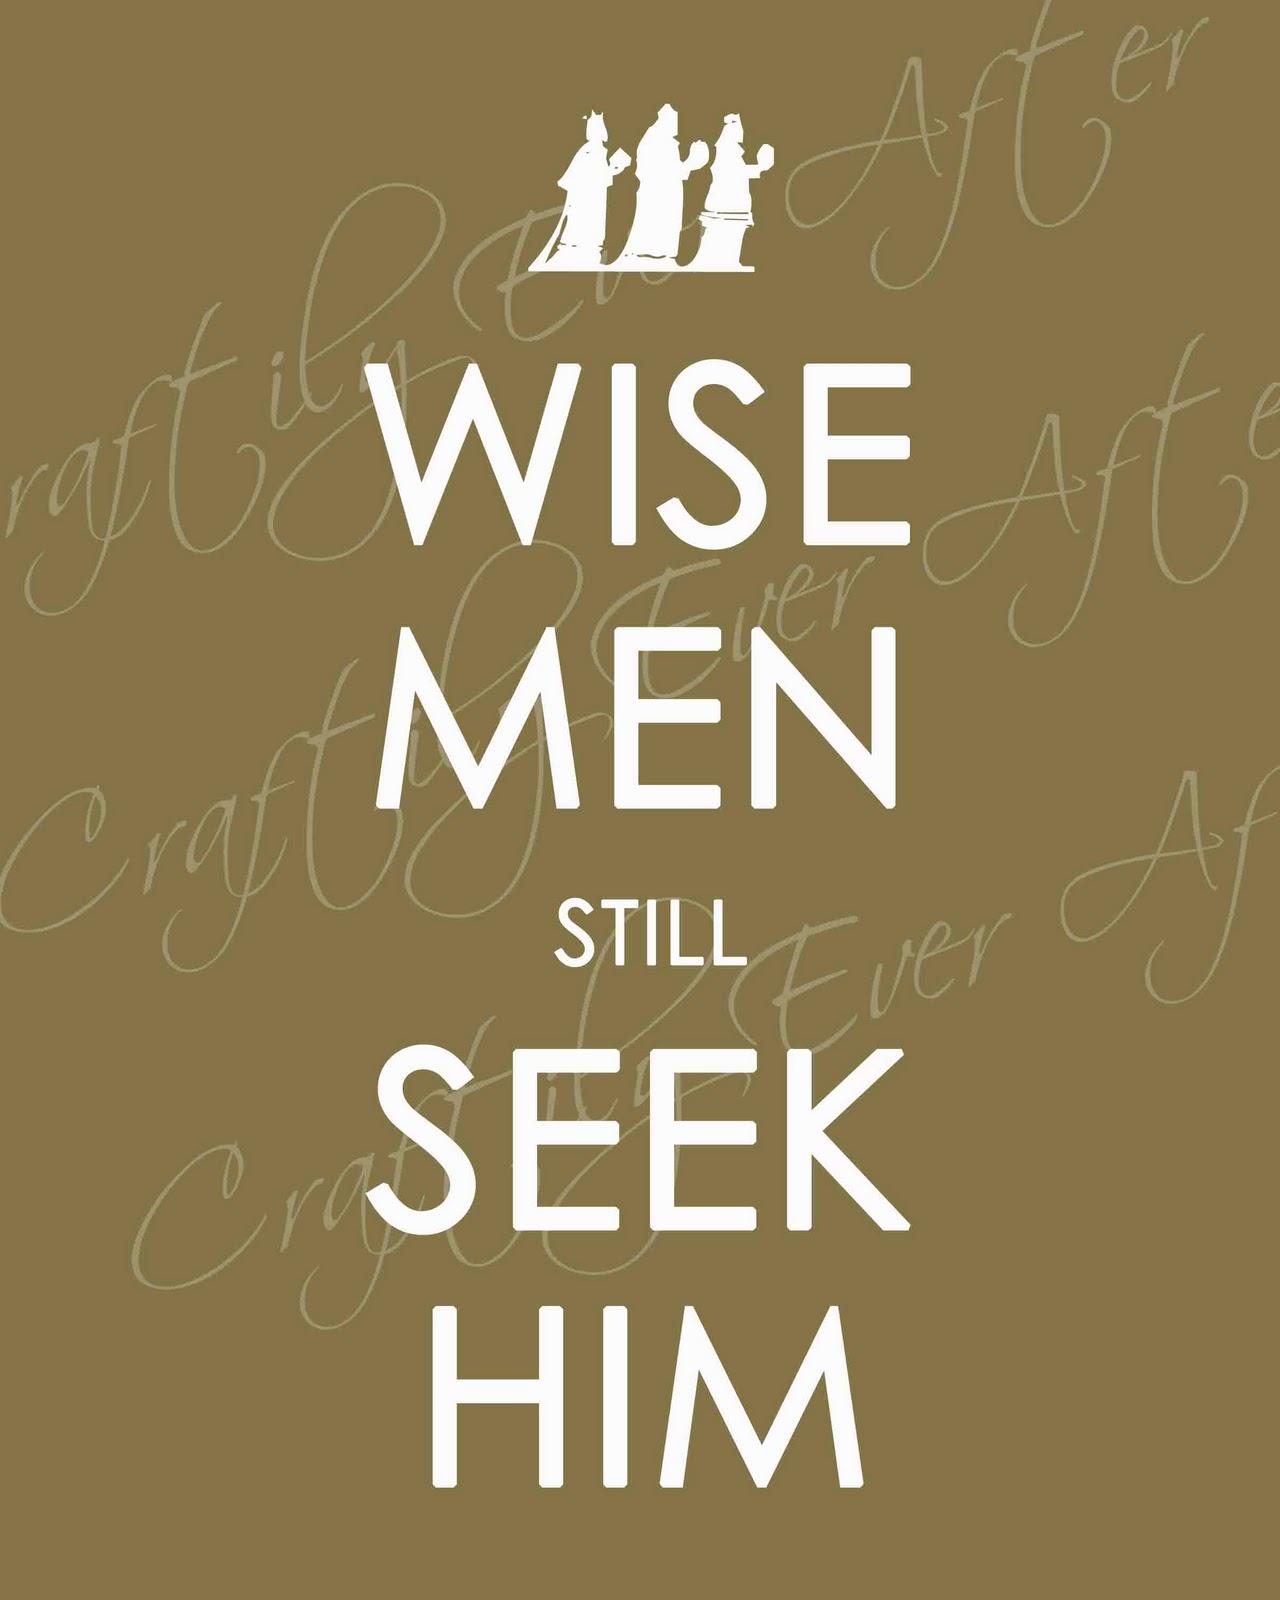 Christmas Wise Men Quotes. QuotesGram